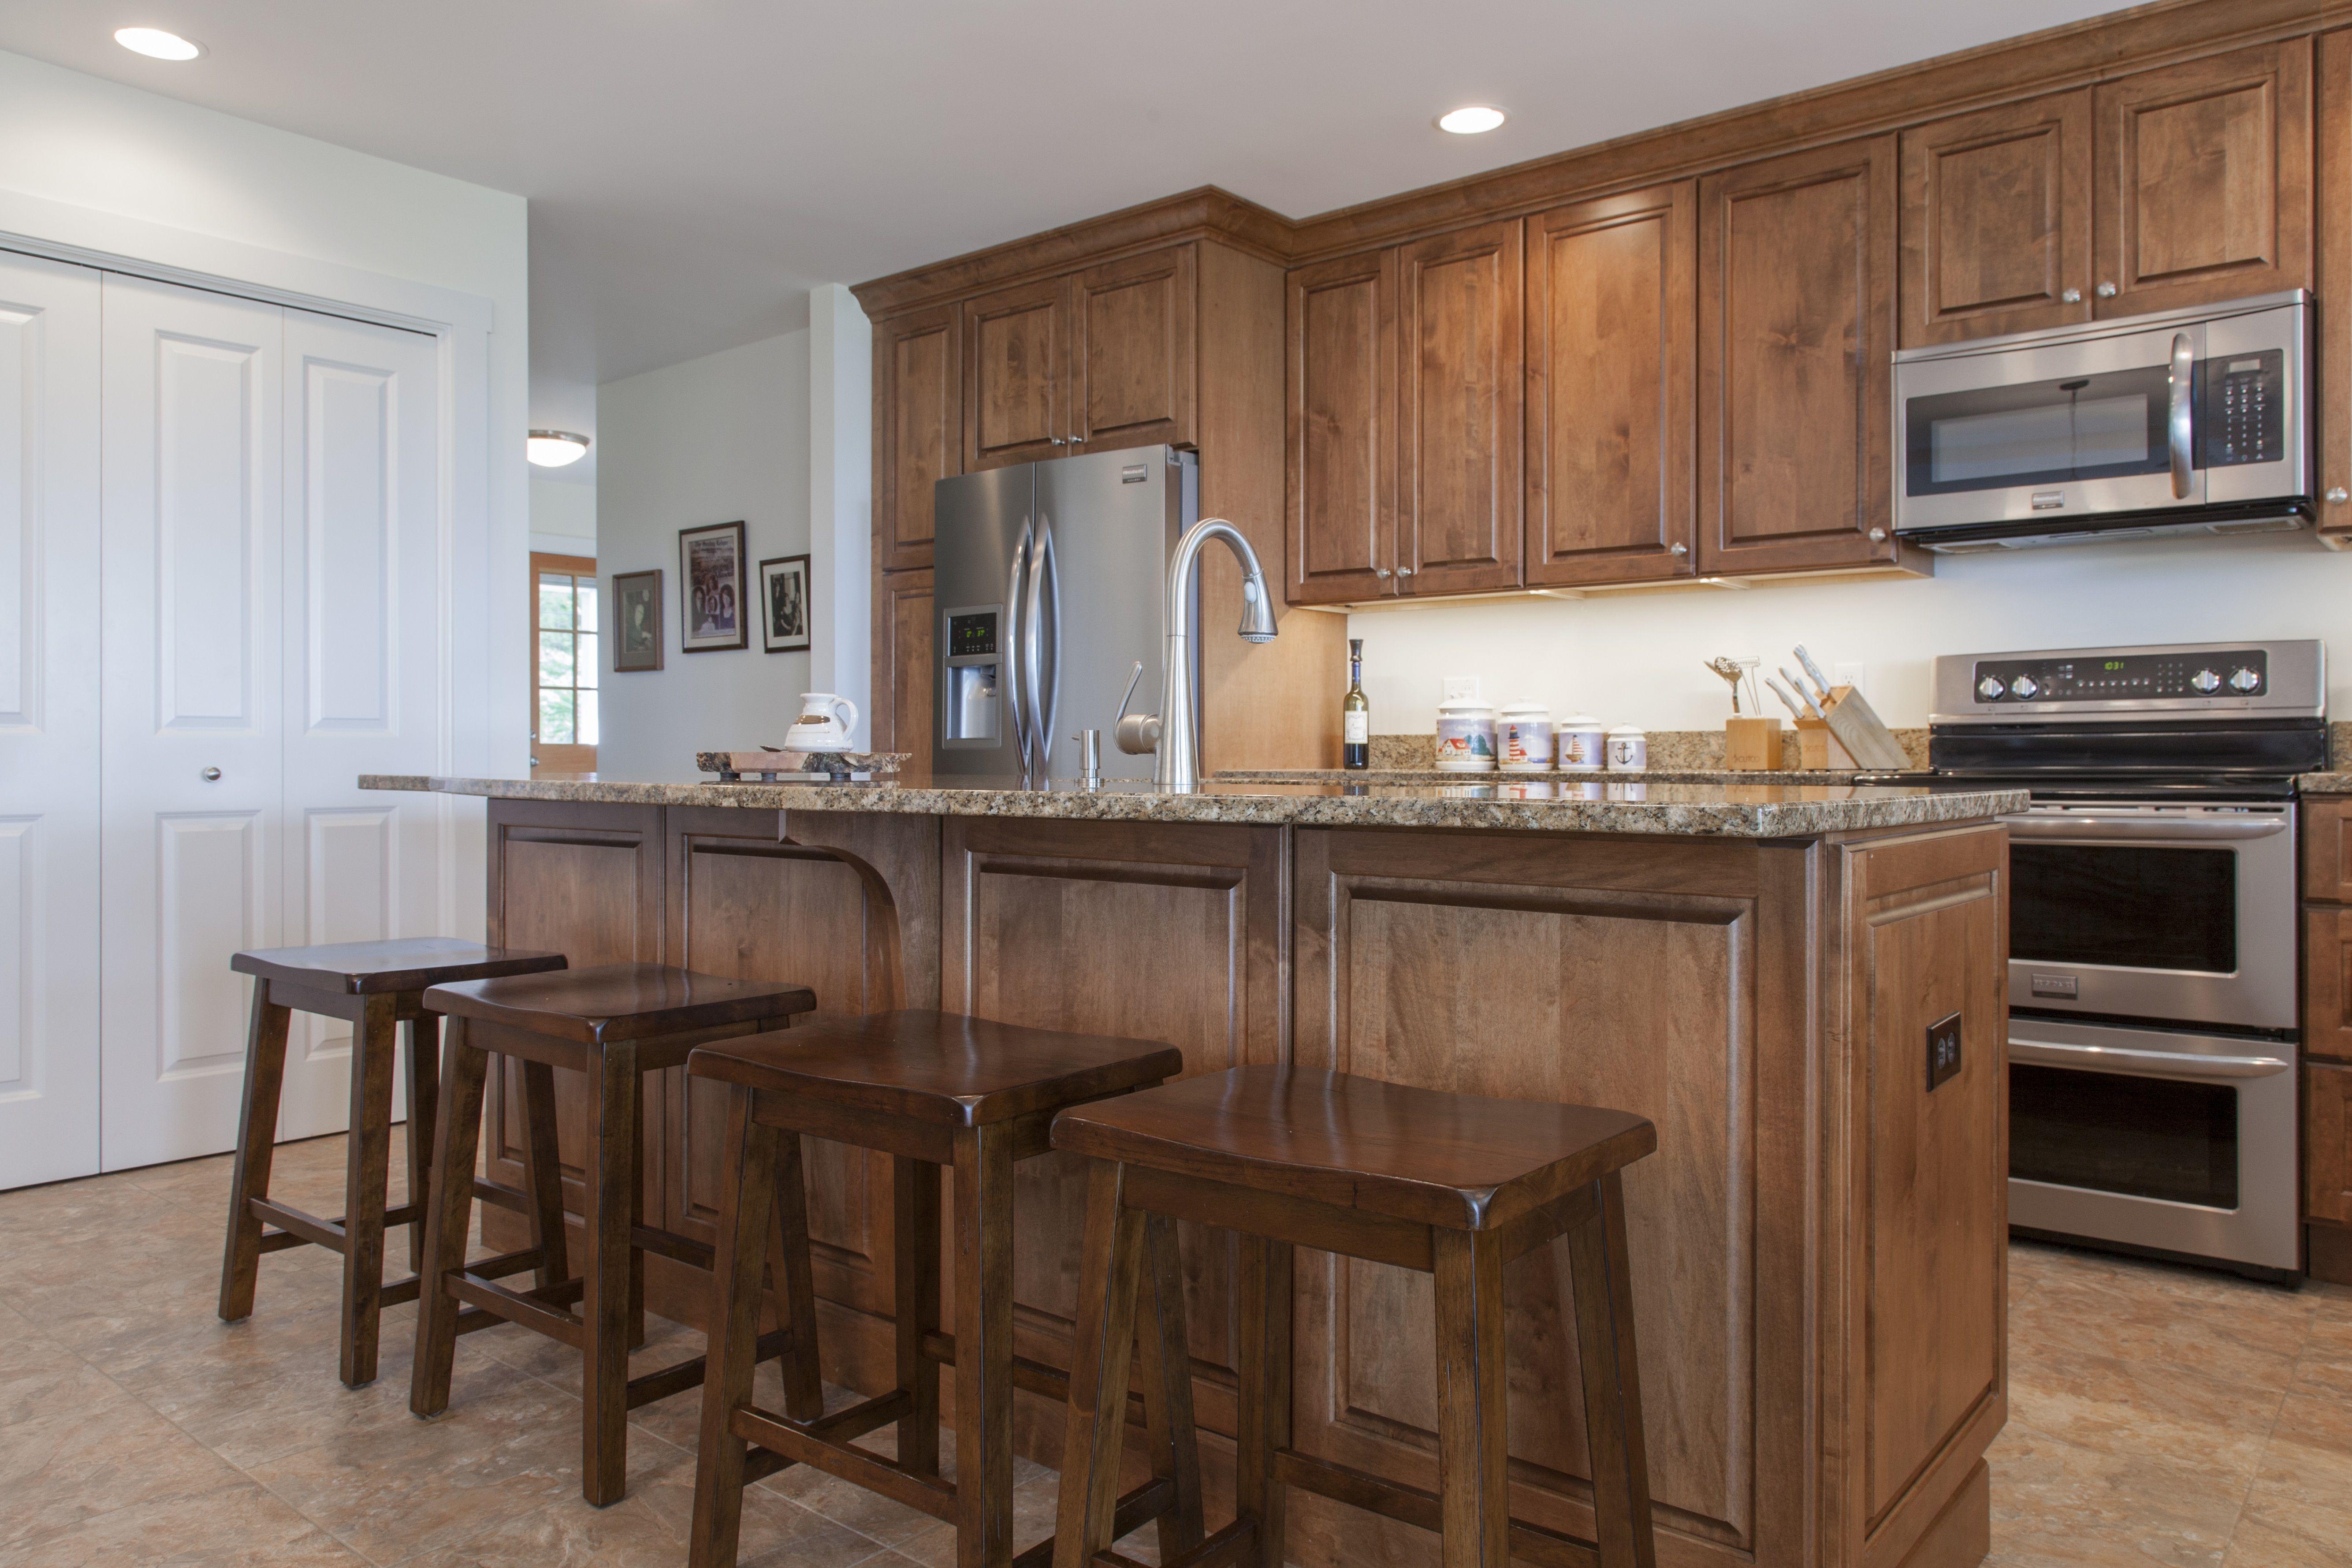 Maple raised panel door style & Giallo Veneziano granite Designed